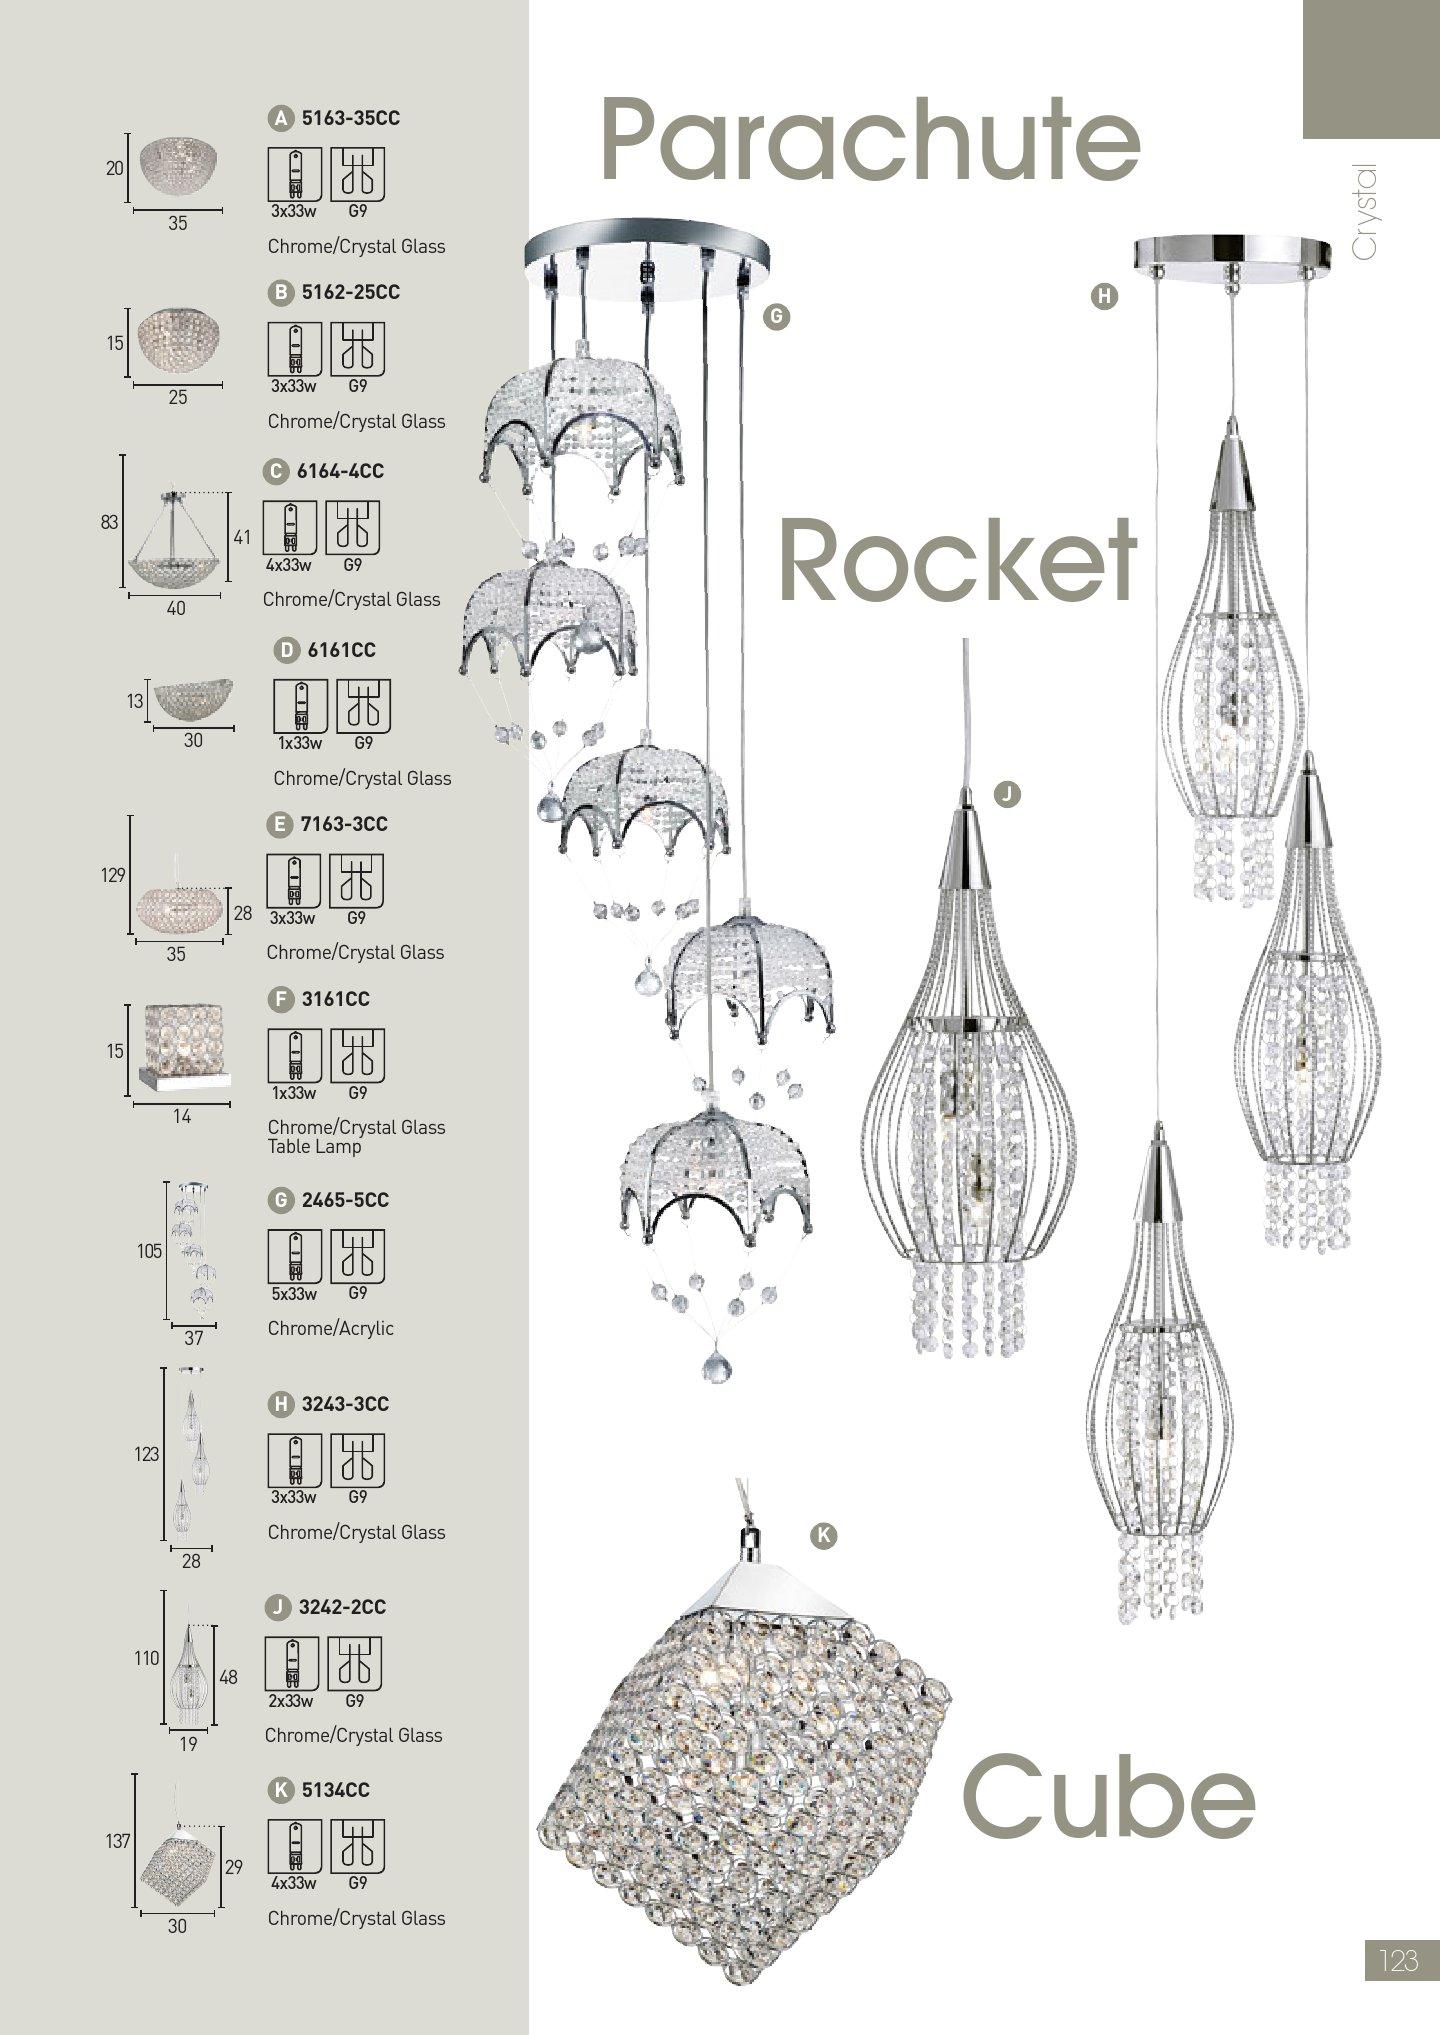 Rocket 3242 2CC Chrome